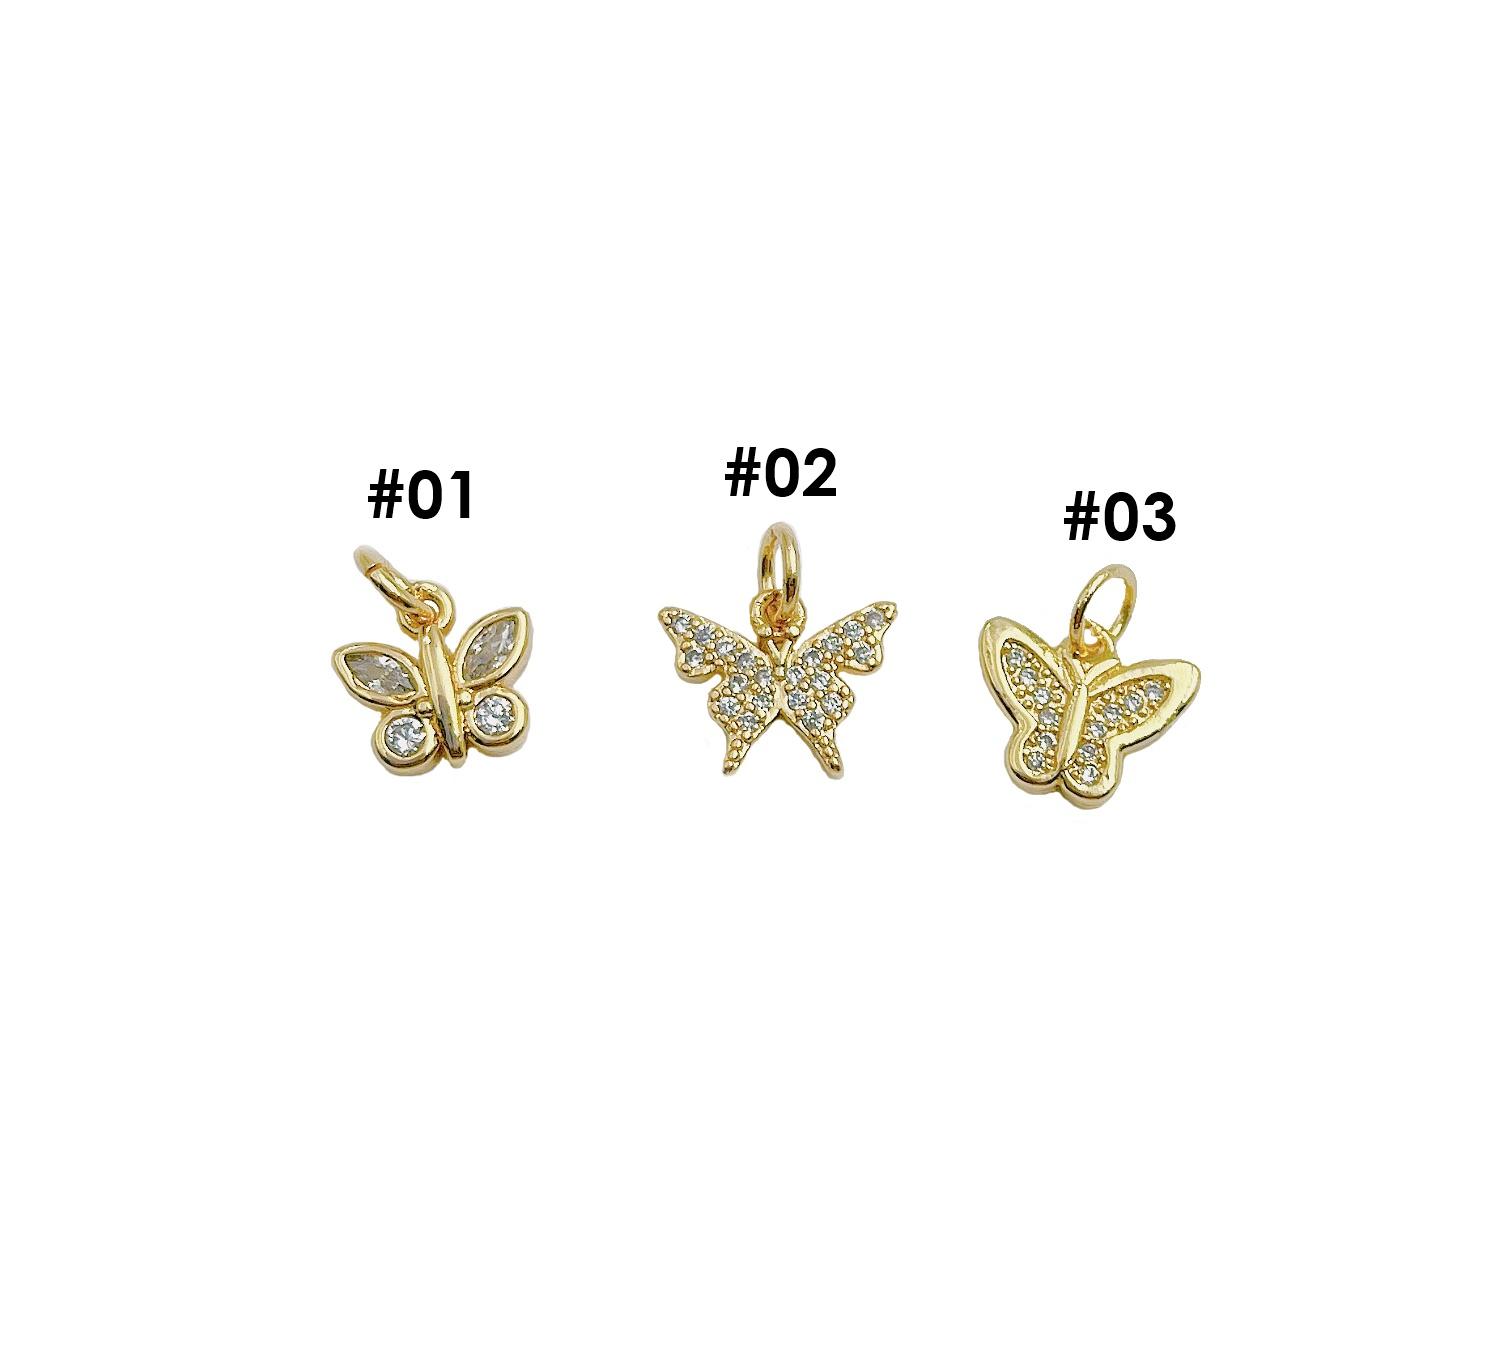 White Enamel CZ Micro Pave Butterfly Shape Pendant,Cubic Zirconia Butterfly Charm,GoldSilverRose Gold Tone,11x7mm,Sku#Y348